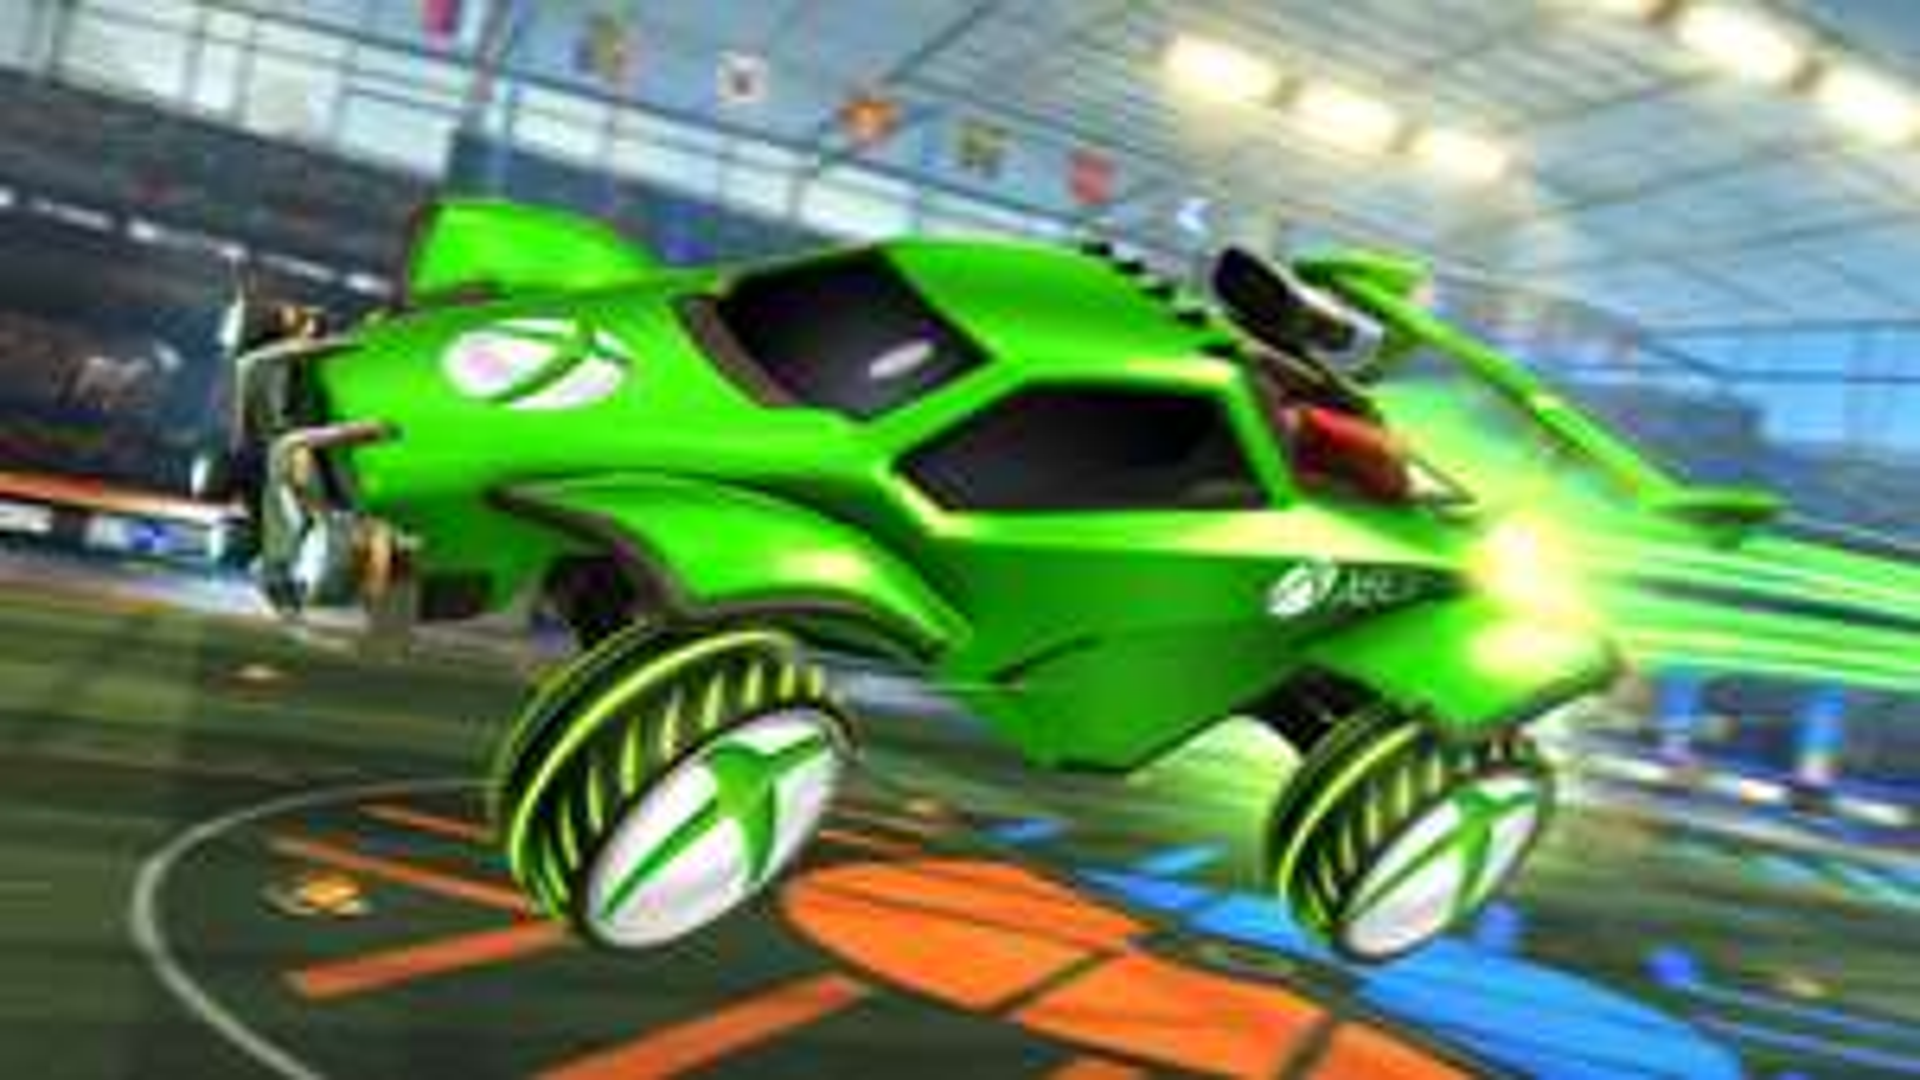 Rocket League Xbox Customization Pack - Free @ Xbox Store